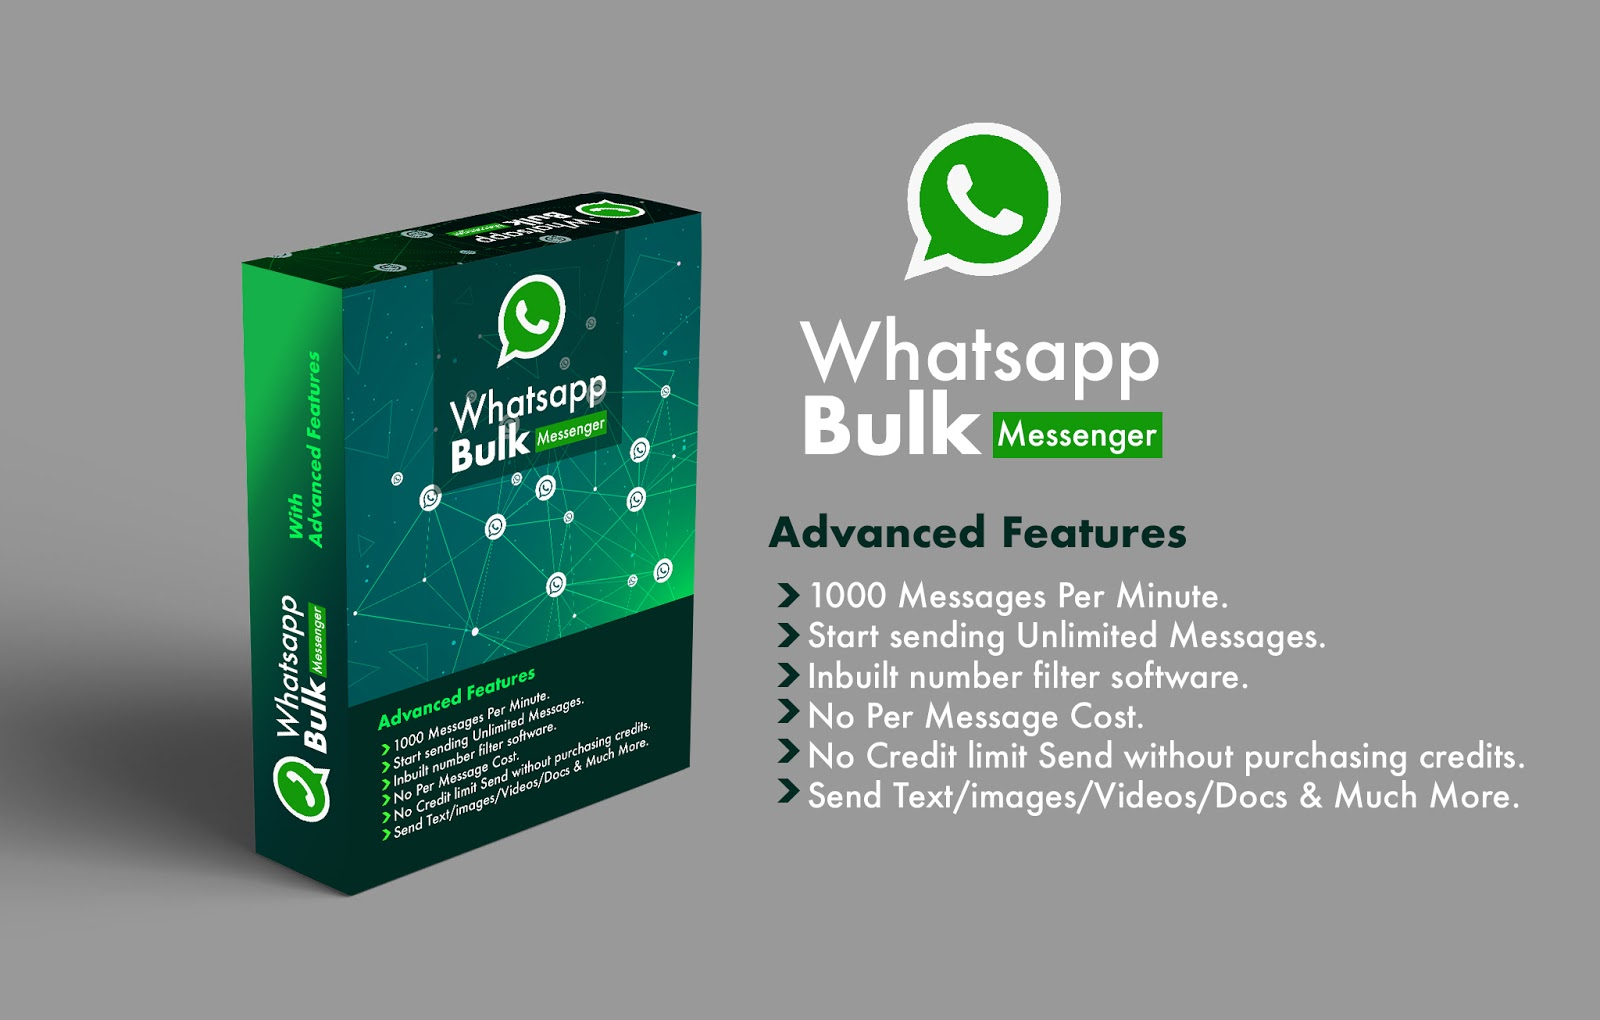 Software Whatsapp Blaster Sender Bulk | Jasa Whatsapp Broadcast | Jasa Google Adwords | Jasa SMS Blast | Jasa Penulis Artikel | Jasa Pembuatan Website | Kelontongan.com